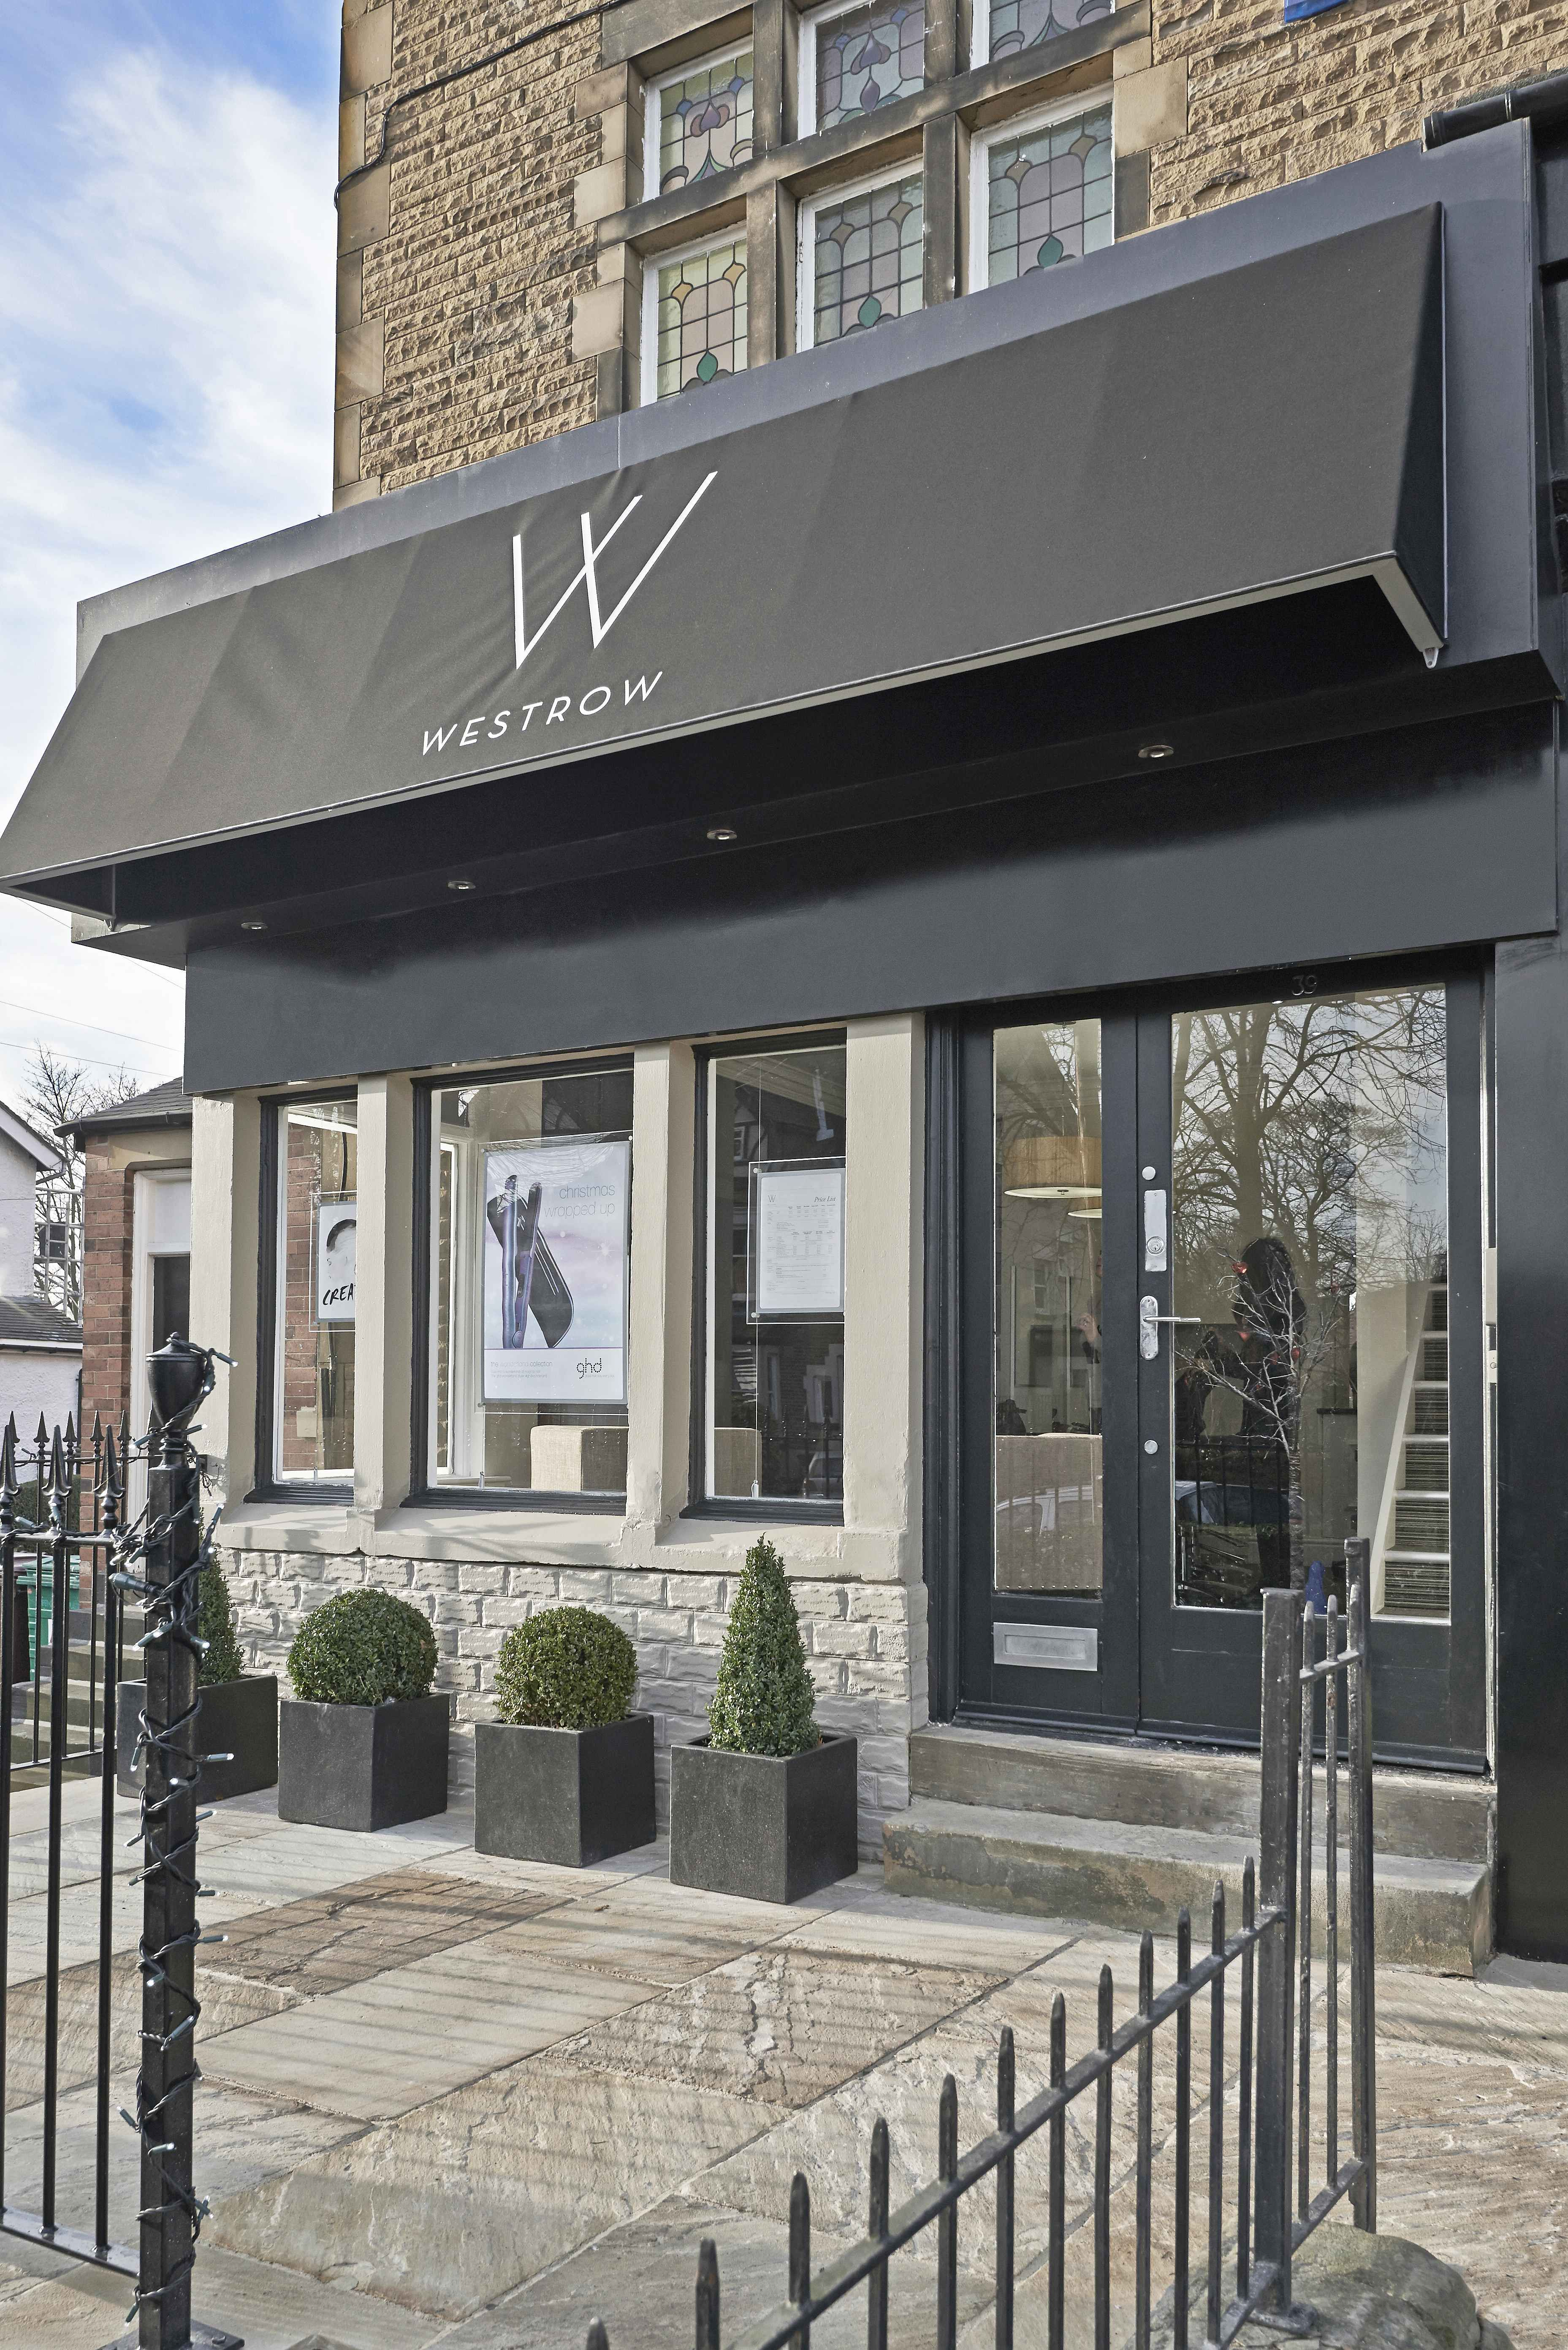 Salon Front Westrow Street Lane Salon Design Outdoor Decor Outdoor Structures